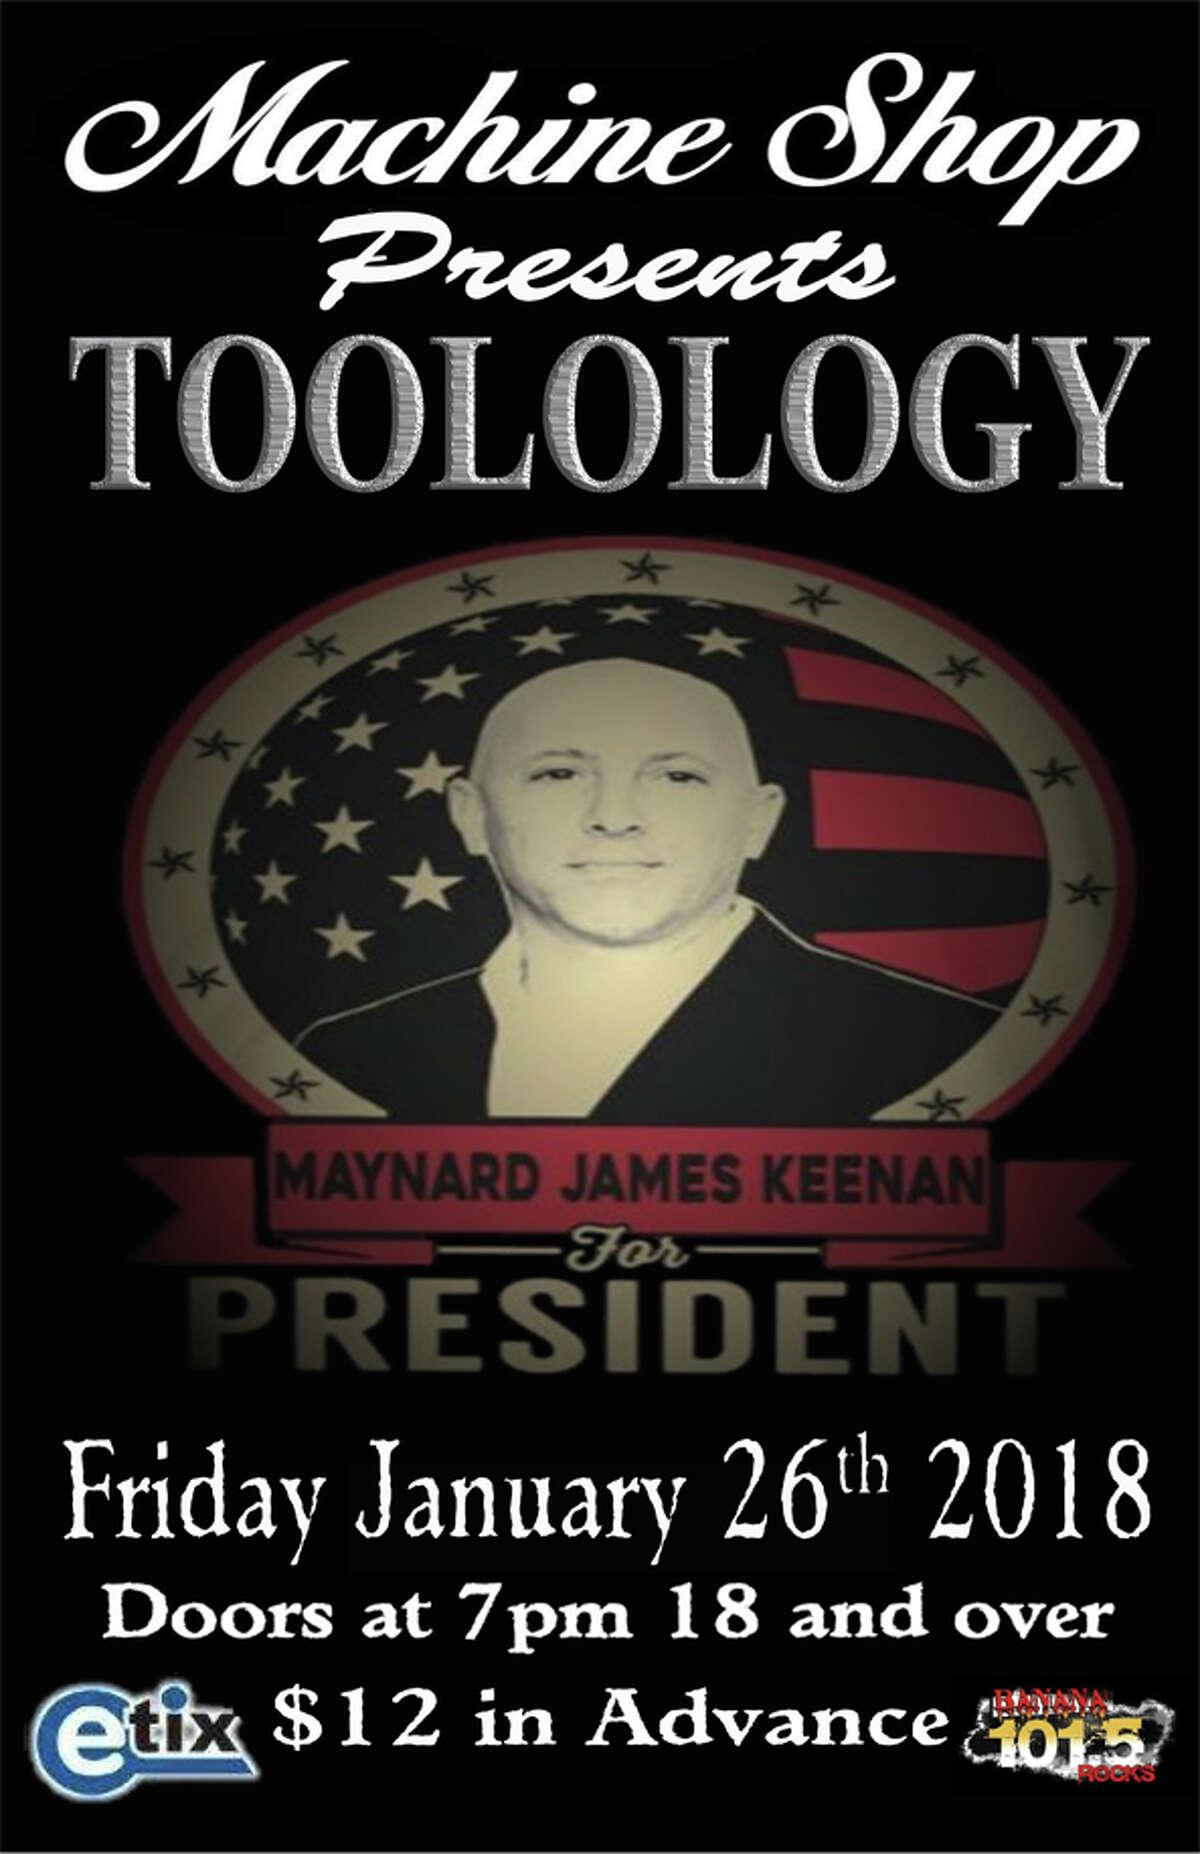 Jan. 26: Toolology, J.R. Casterfish, 7 p.m., The Machine Shop, Flint, www.themachineshop.info